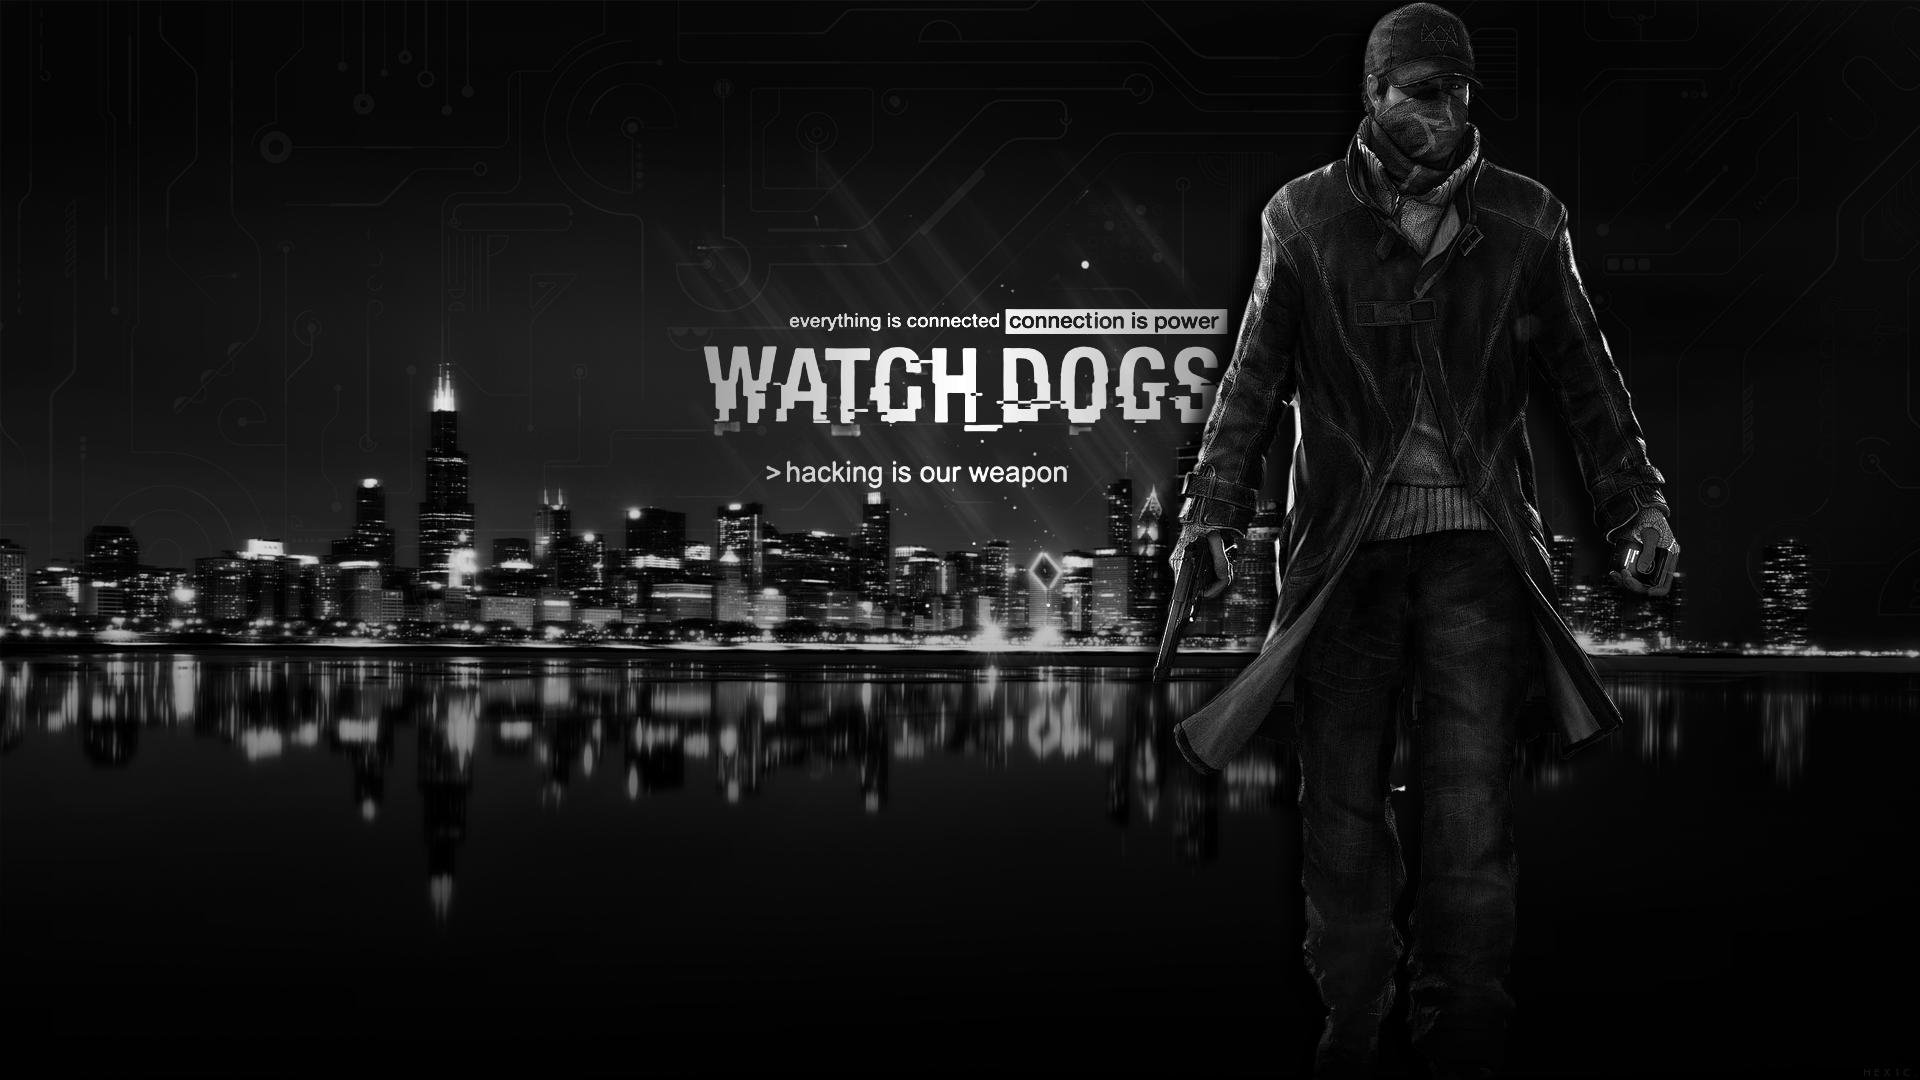 Free Download Watch Dogs Wallpaper Watch Dogs Wallpaper Hd By